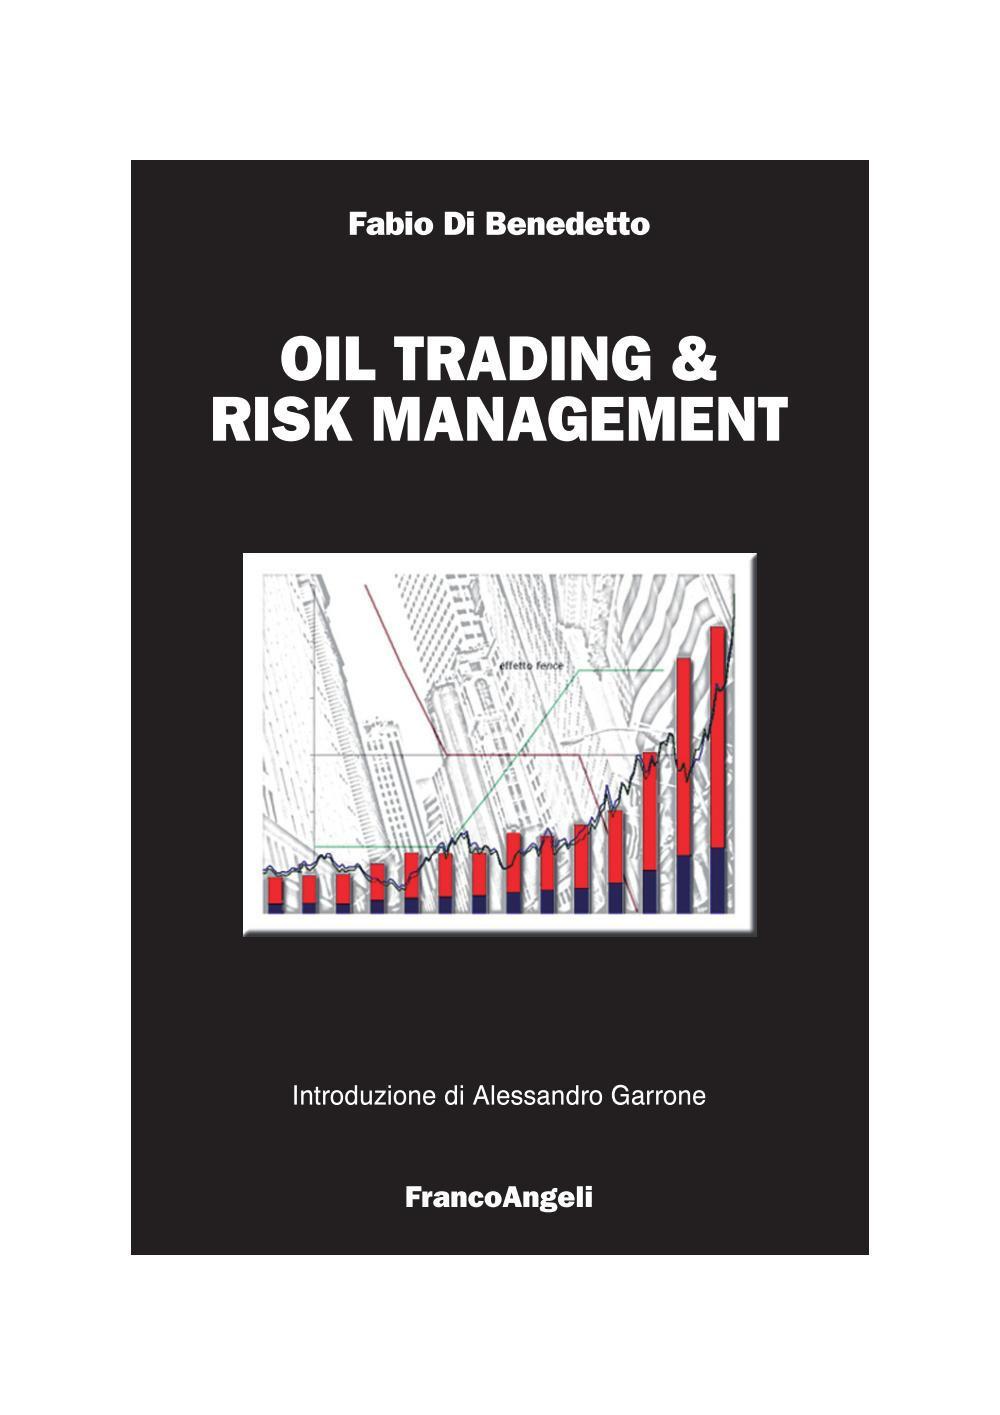 Oil trading & risk management